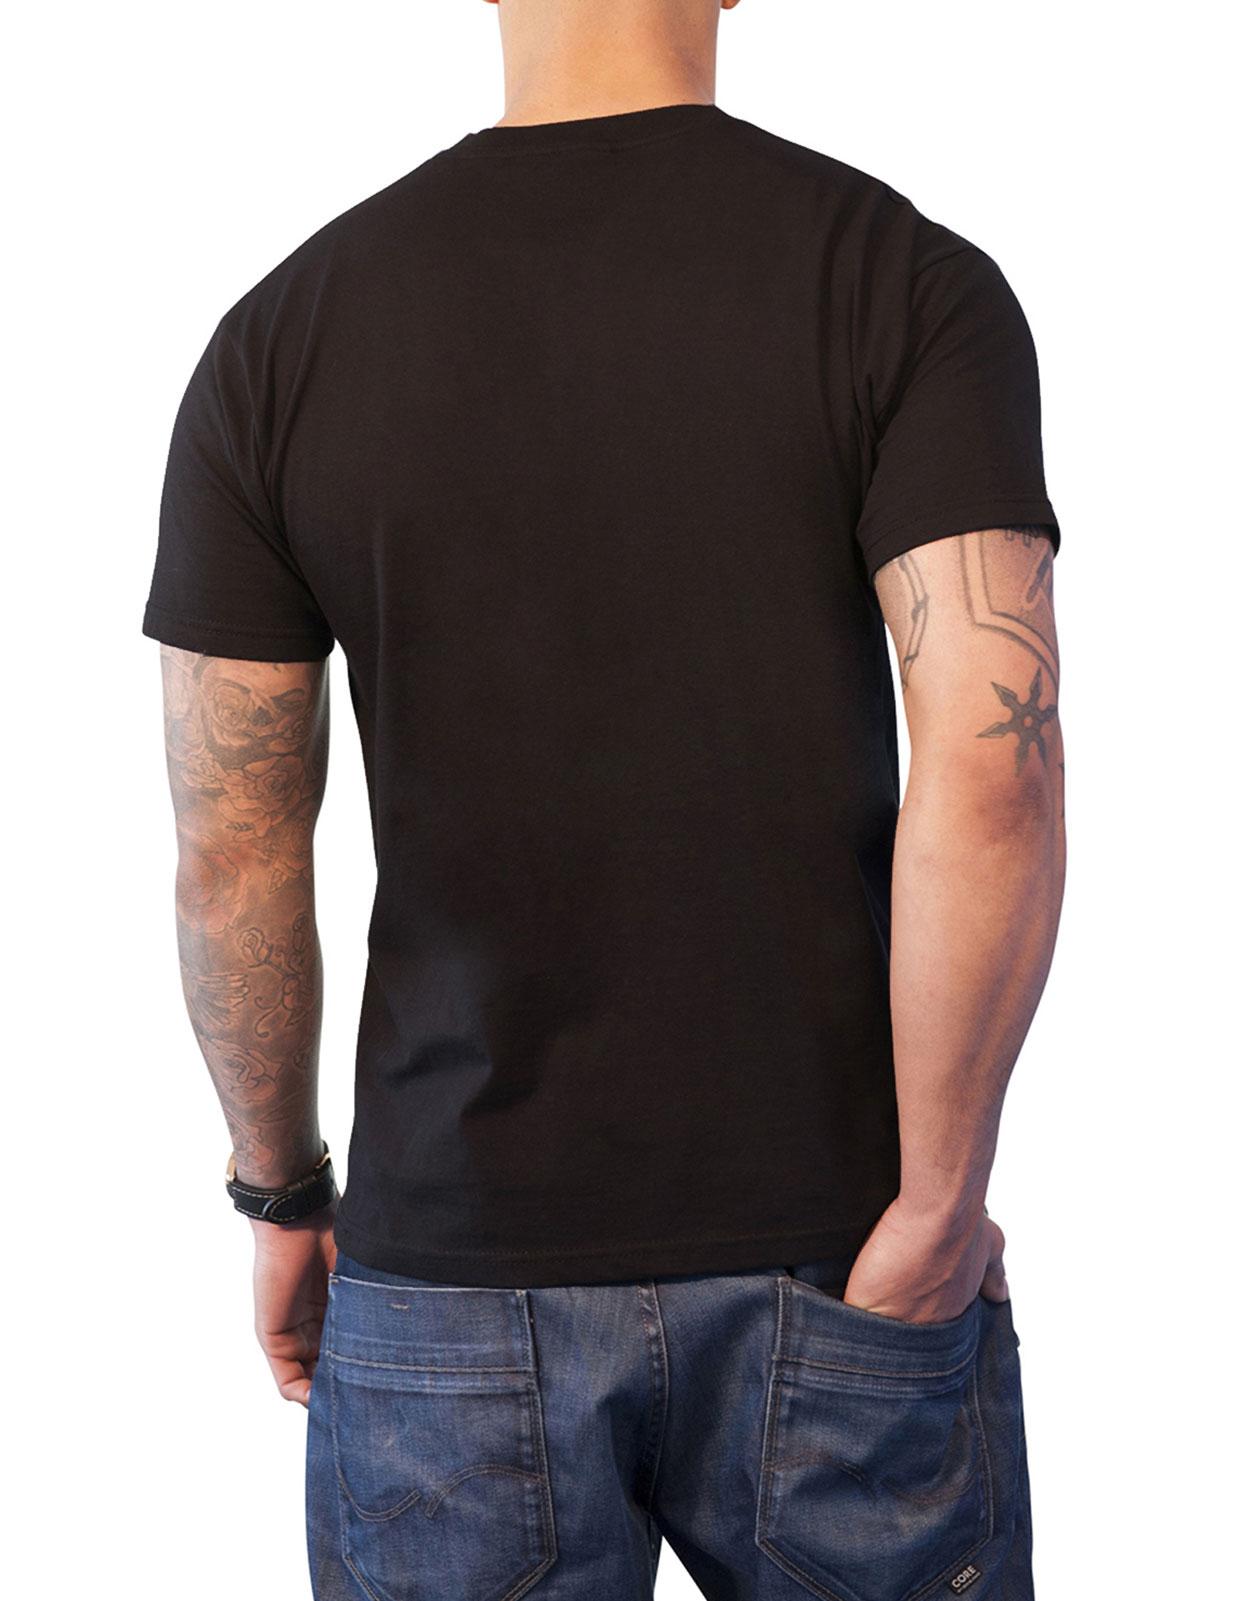 Camiseta-Last-Jedi-De-Star-Wars-Movie-Poster-porgs-Guardia-pretoriana-oficial-para-hombre miniatura 29